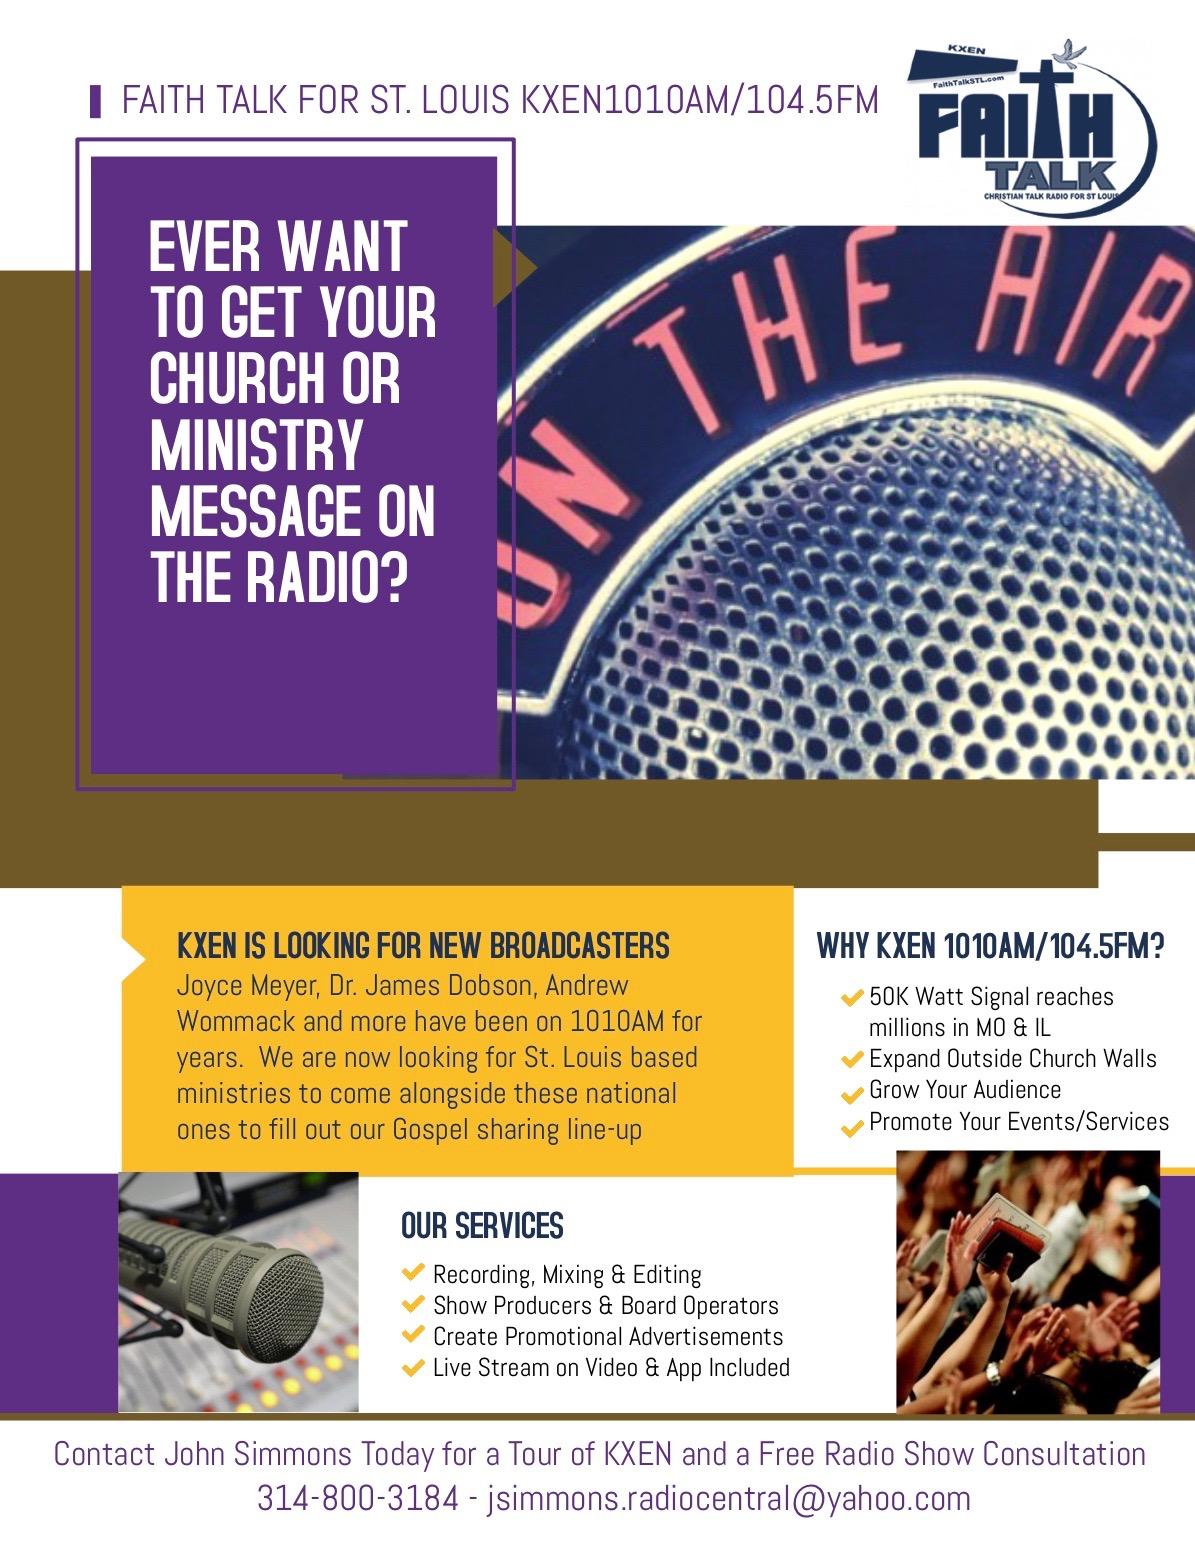 kxen new broadcasters flyer.jpg